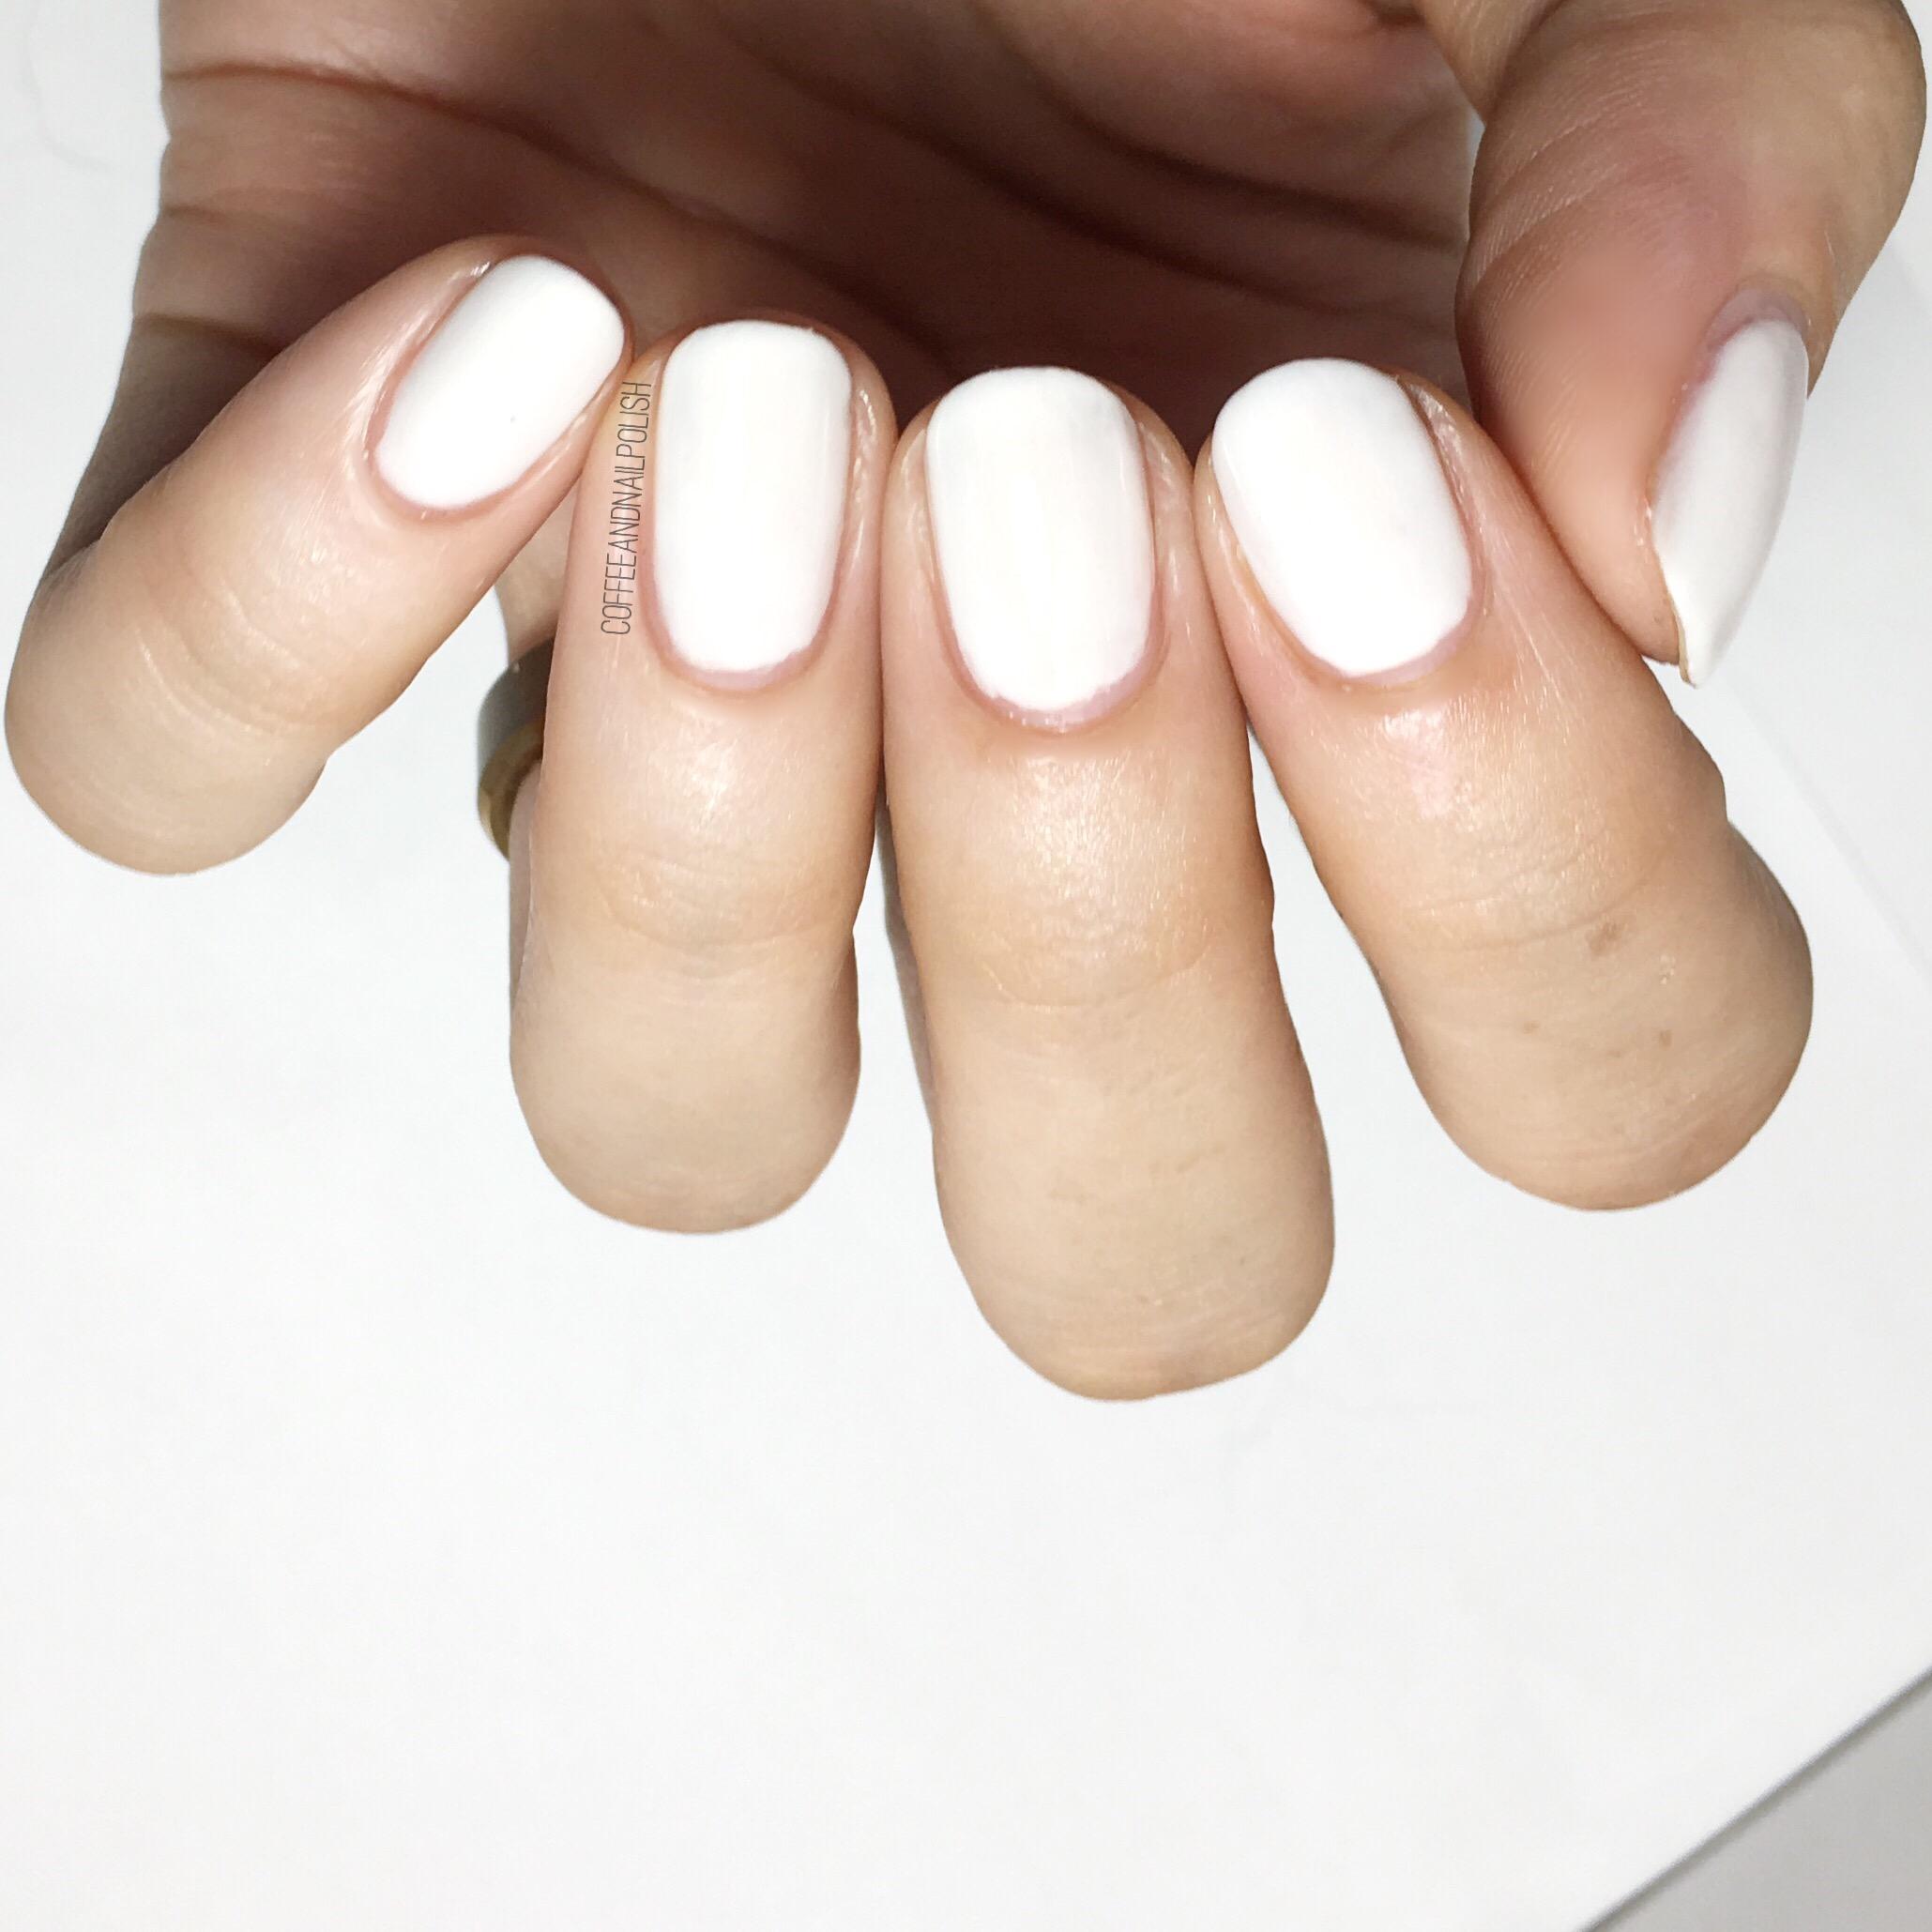 Essie White Nail Polish Swatches | Splendid Wedding Company